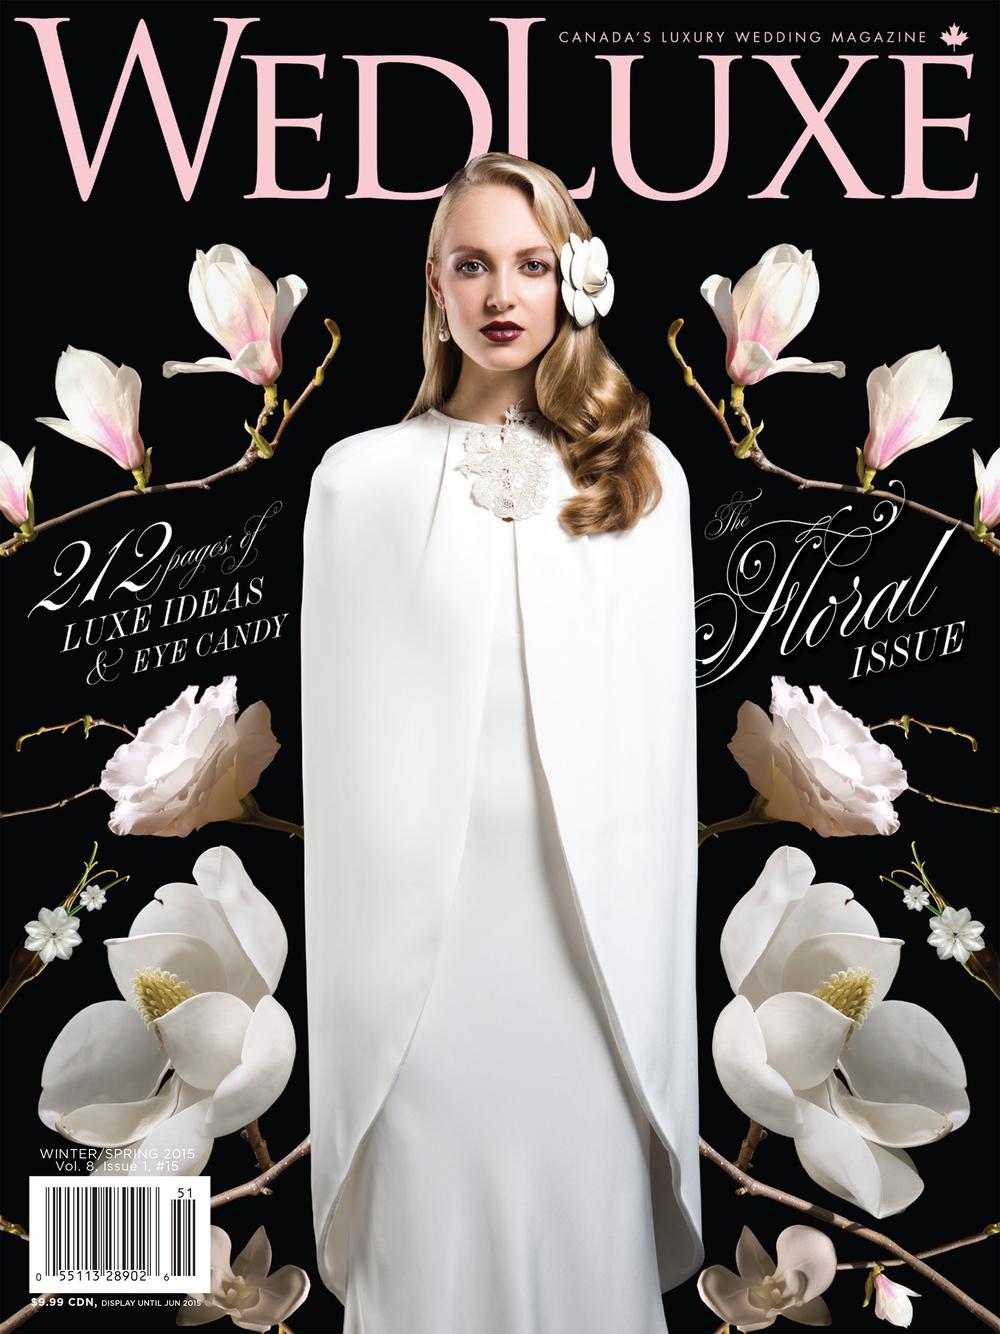 WedLuxeMagazine_WS15_TorontoCover2-1.jpg